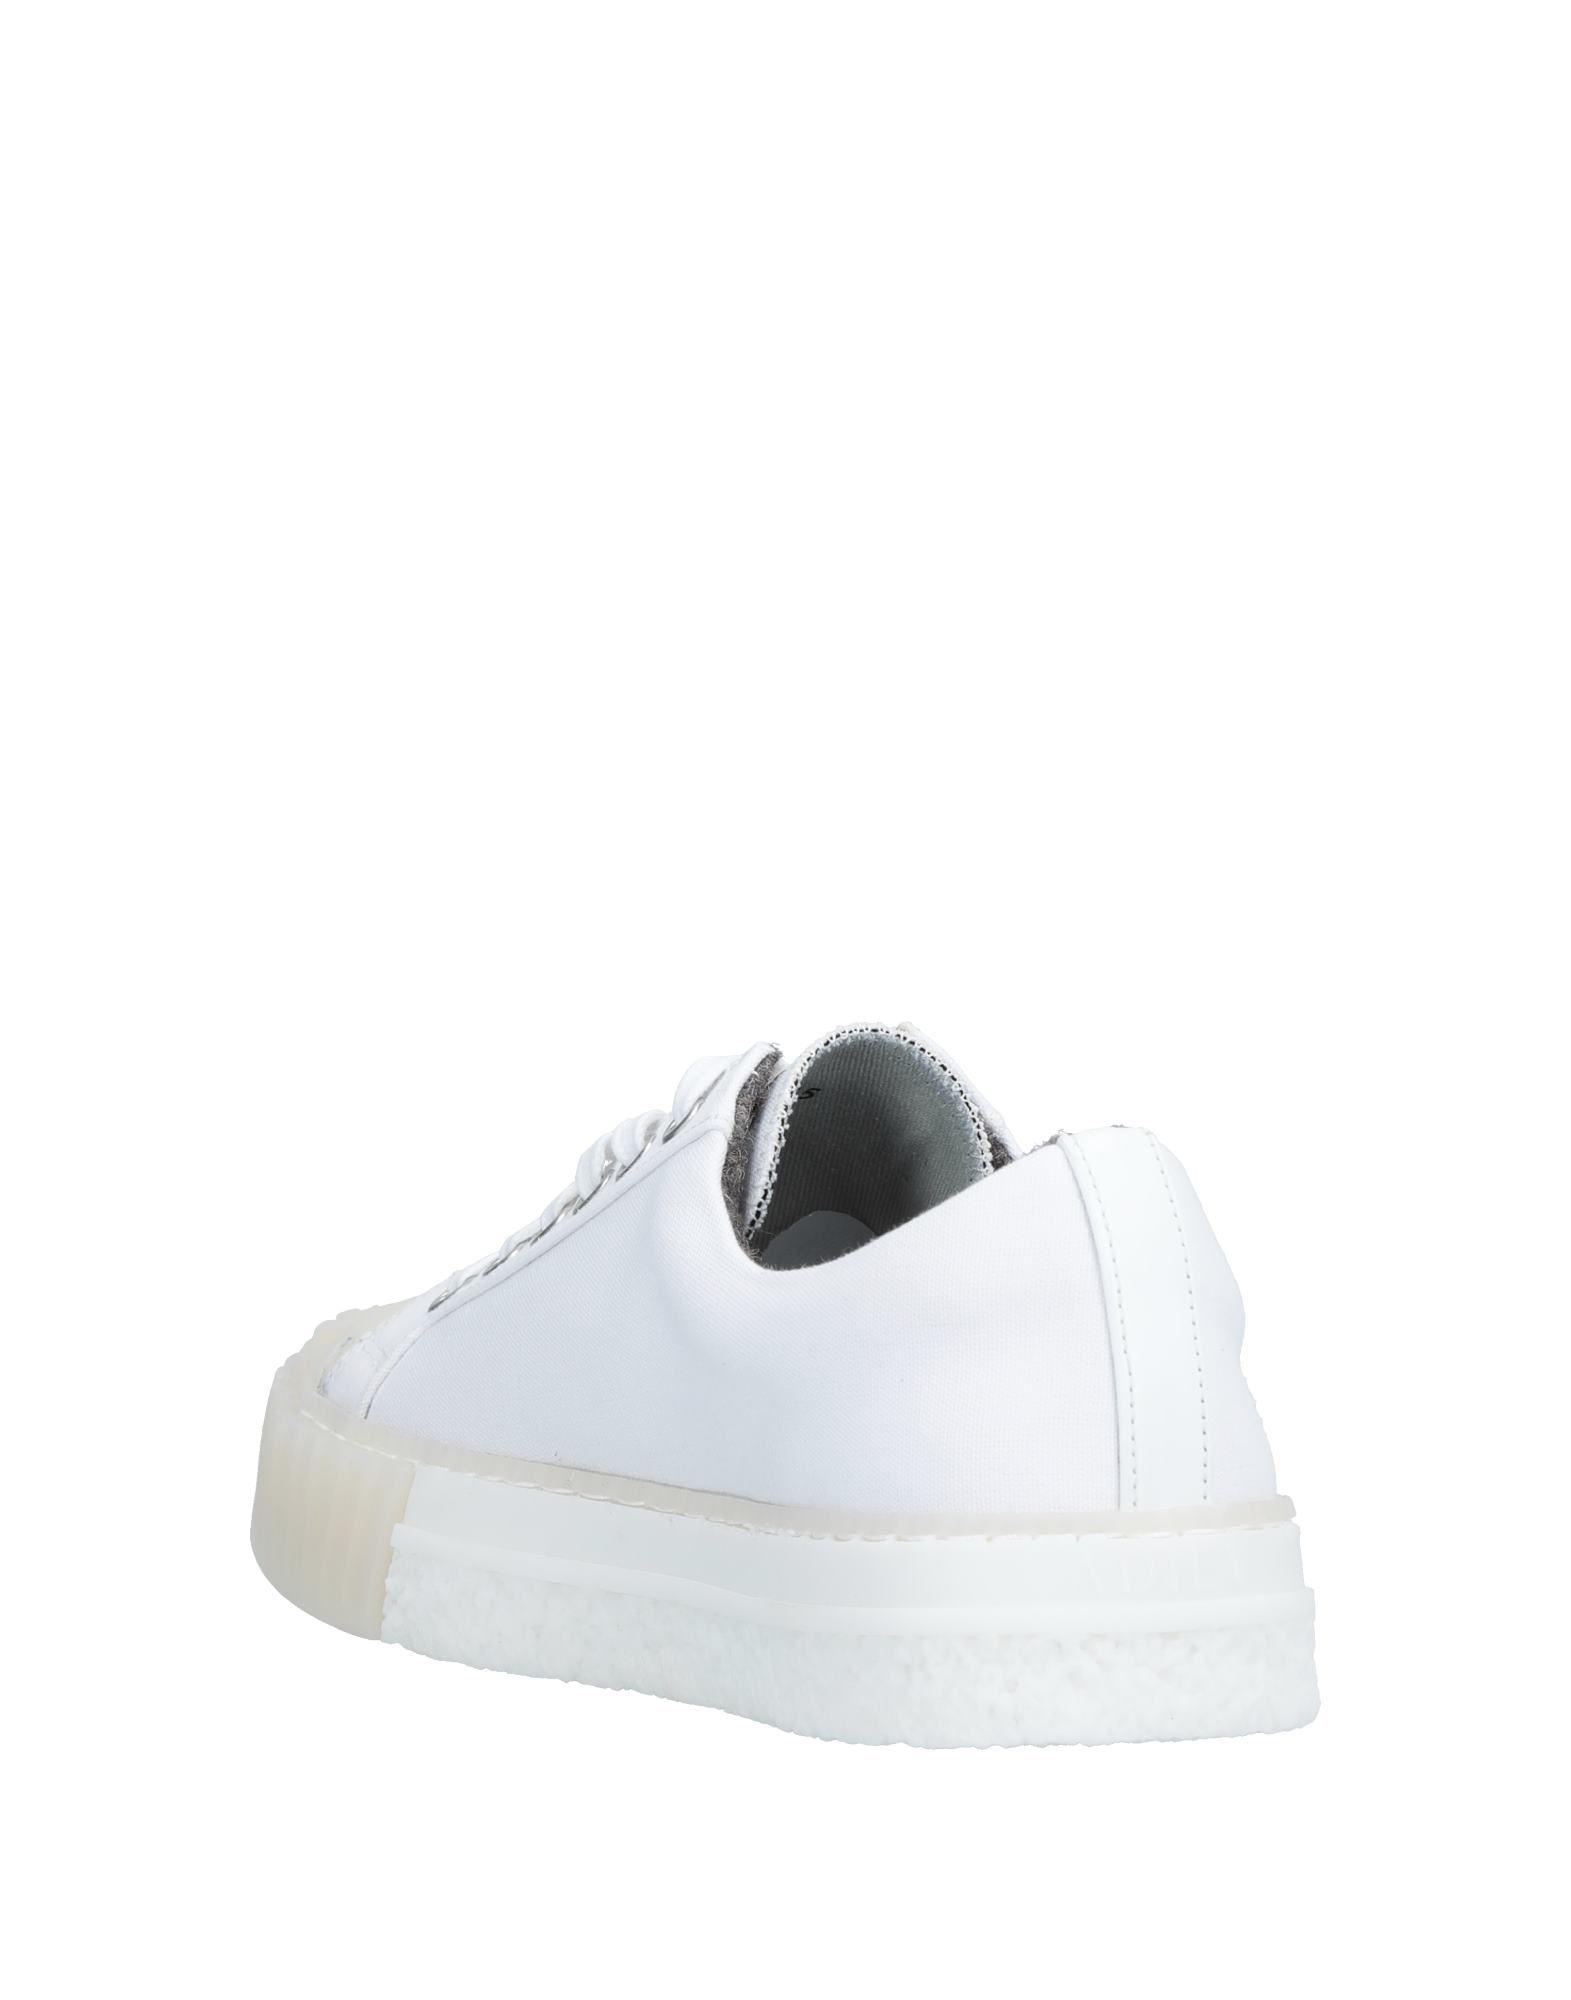 Adieu Sneakers Damen Heiße  11534452QA Heiße Damen Schuhe 6eef50